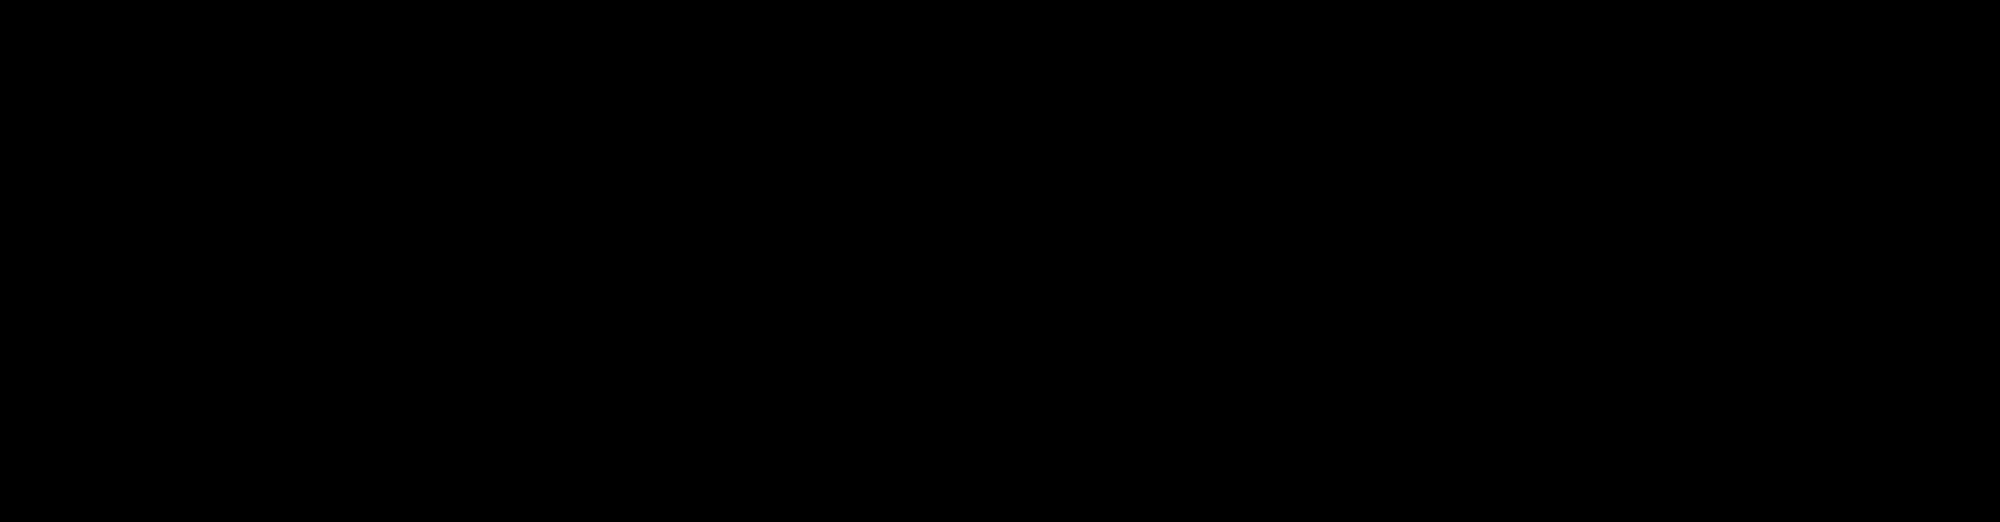 Bellingham Community Chorus-logo-black (1).png